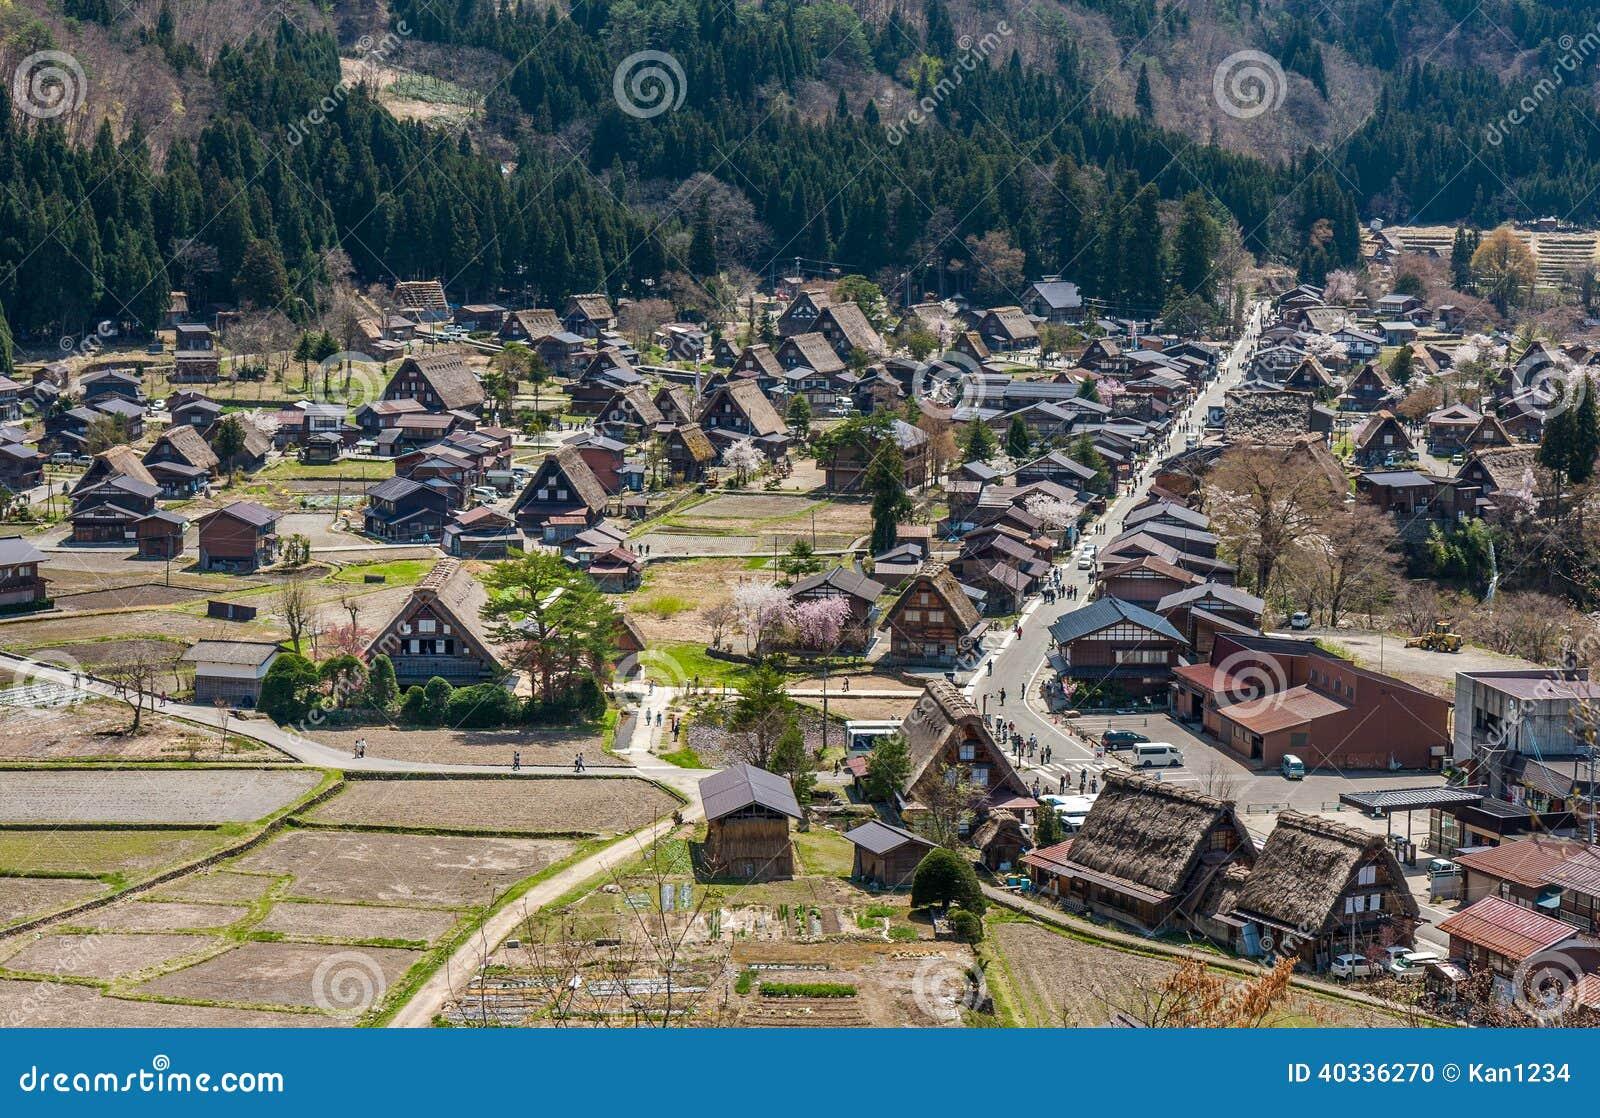 shirakawa vont la ville japonaise traditionnelle japon photo stock image 40336270. Black Bedroom Furniture Sets. Home Design Ideas